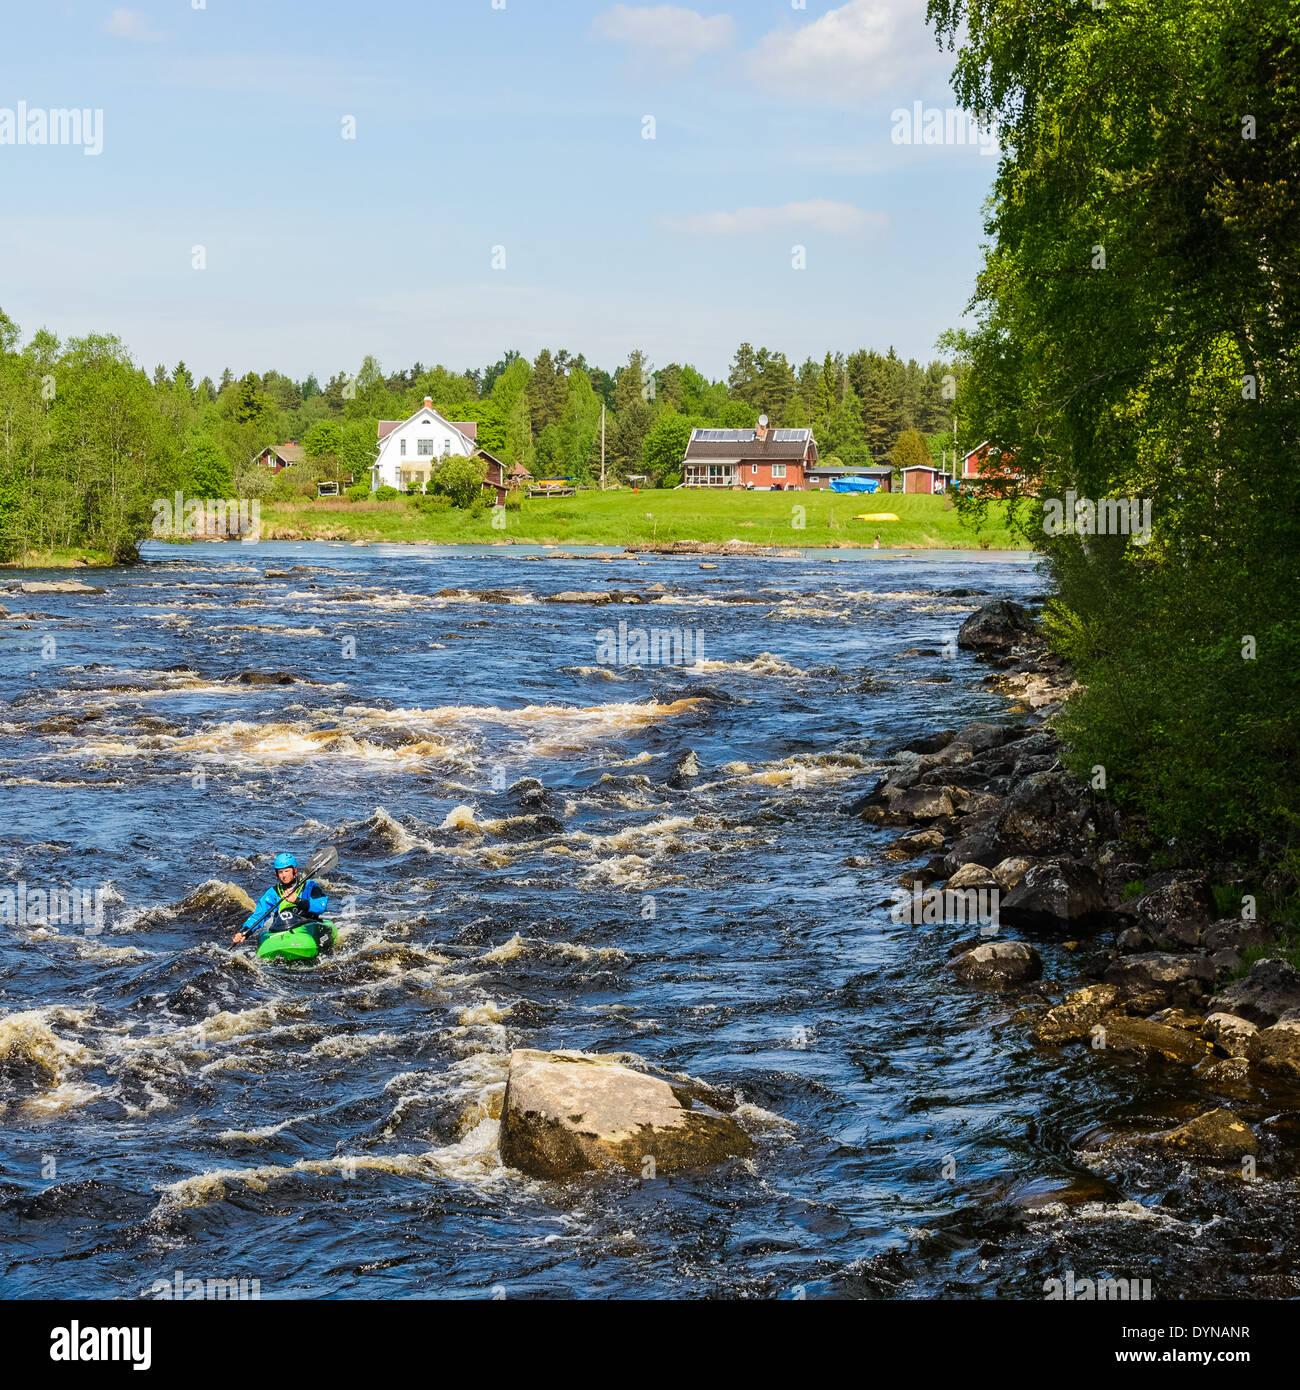 Kayaking on rapid river, Sweden - Stock Image